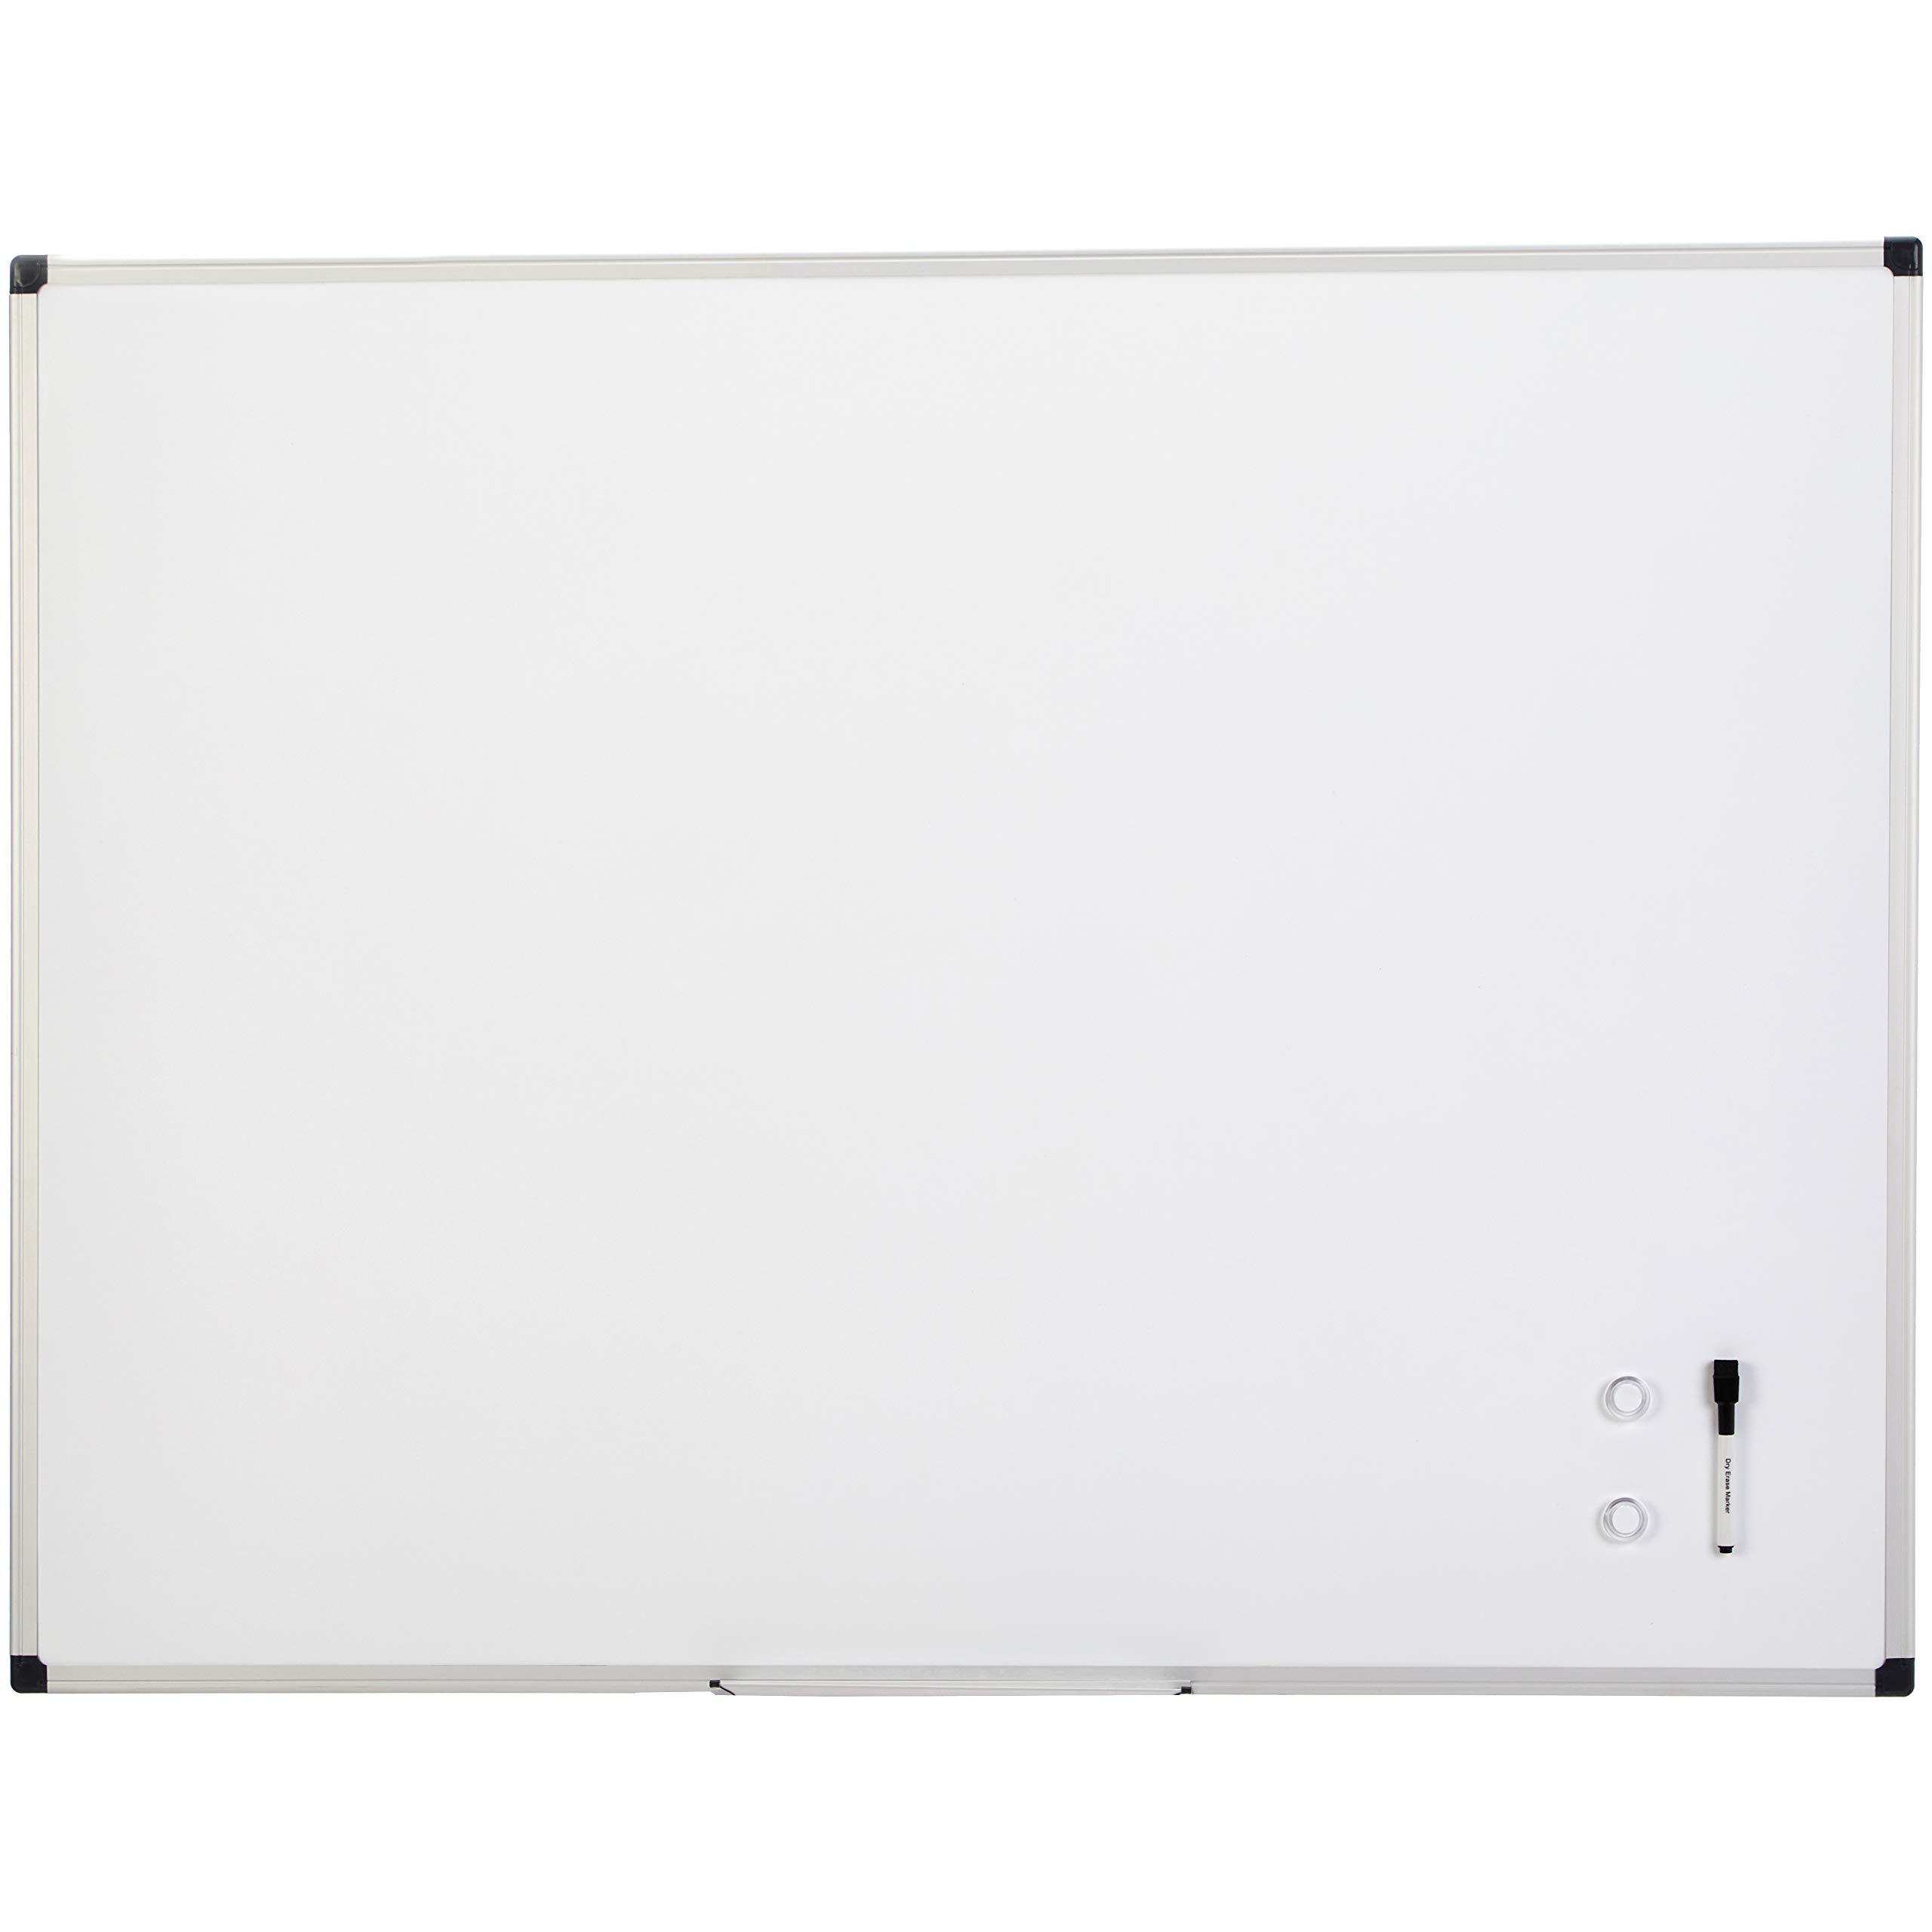 AmazonBasics Magnetic Framed Dry Erase White Board, 36 x 48 Inch by AmazonBasics